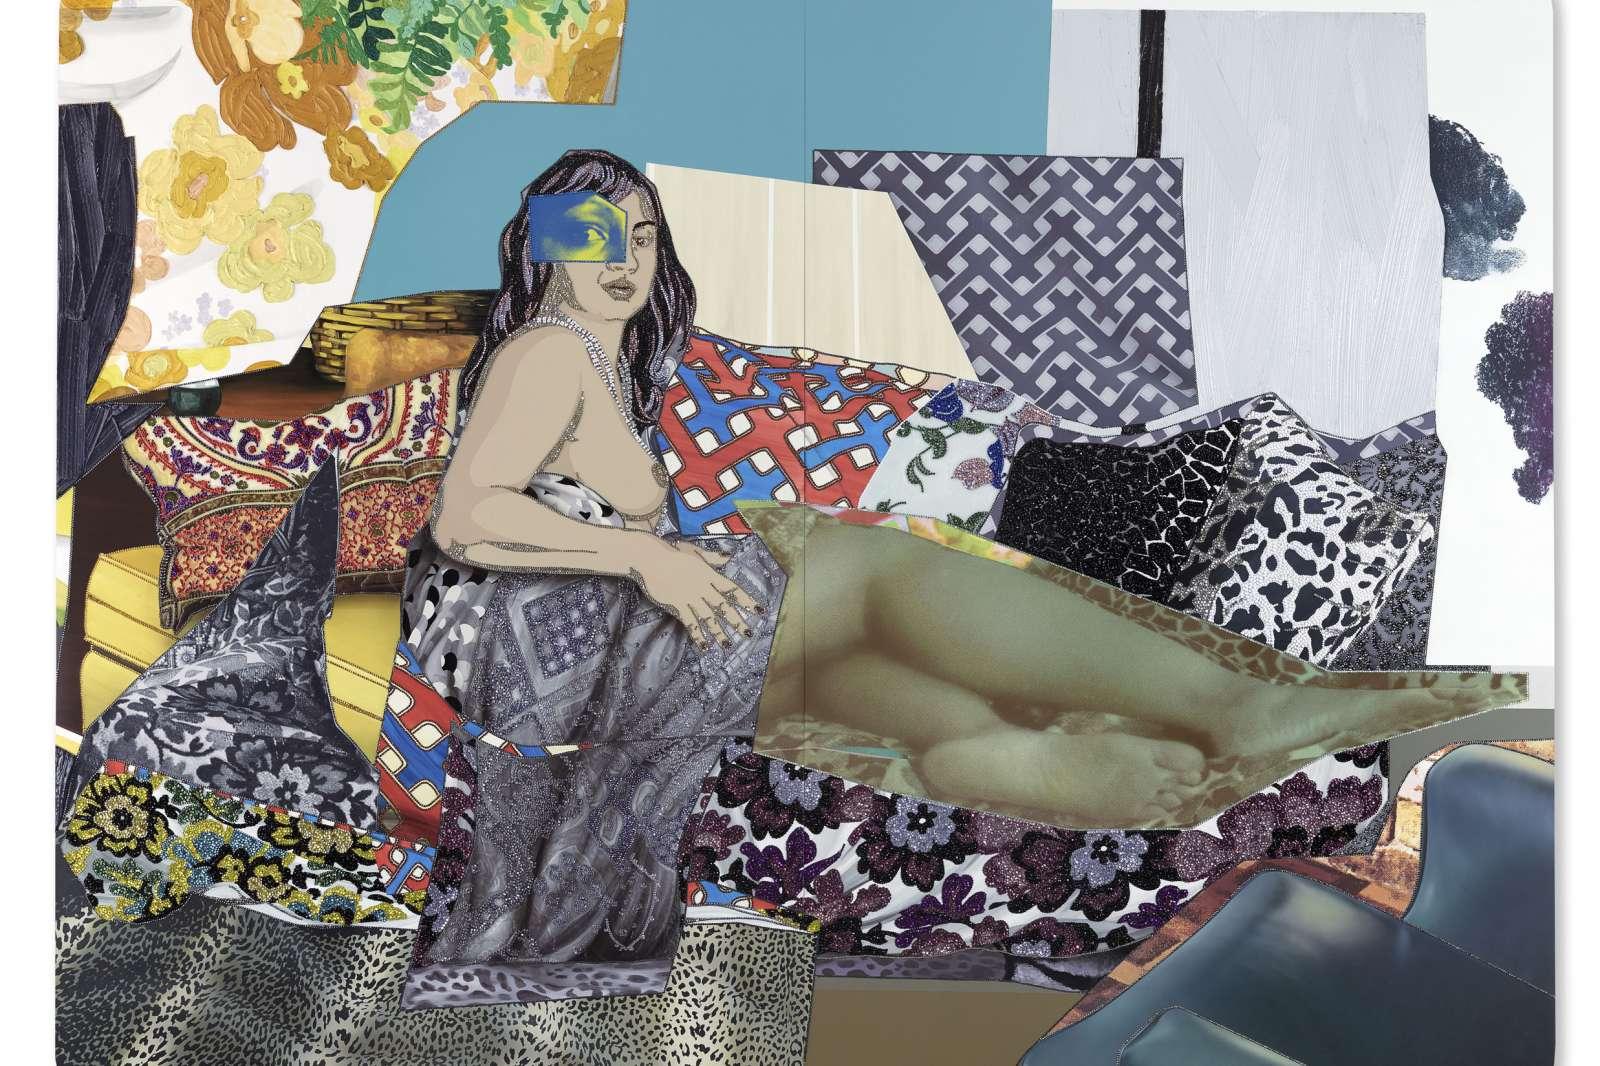 Mickalene Thomas, Shinique: Now I Know, 2015. Rhinestones, acrylic and oil on wood panel.  96 x 120 inches. © Mickalene Thomas